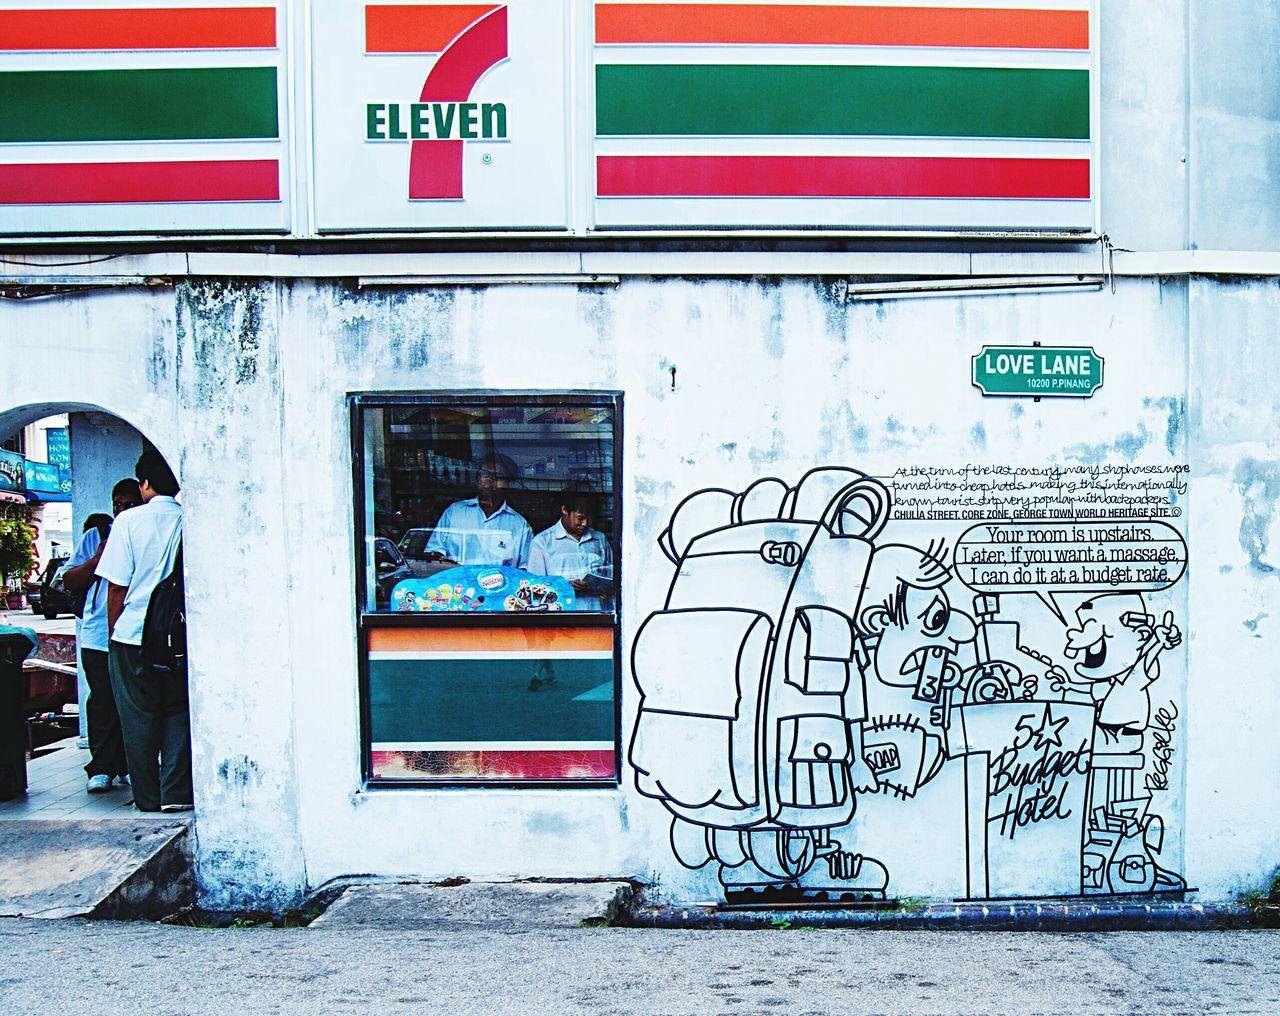 Georgetown Graffiti Street Art Building Exterior Authentic Streetart Contemporary Culture Art Love Lane Penang World Heritage Site Hostel Backpacker Funny Malaysia Travel Southeastasia Asian  7-11